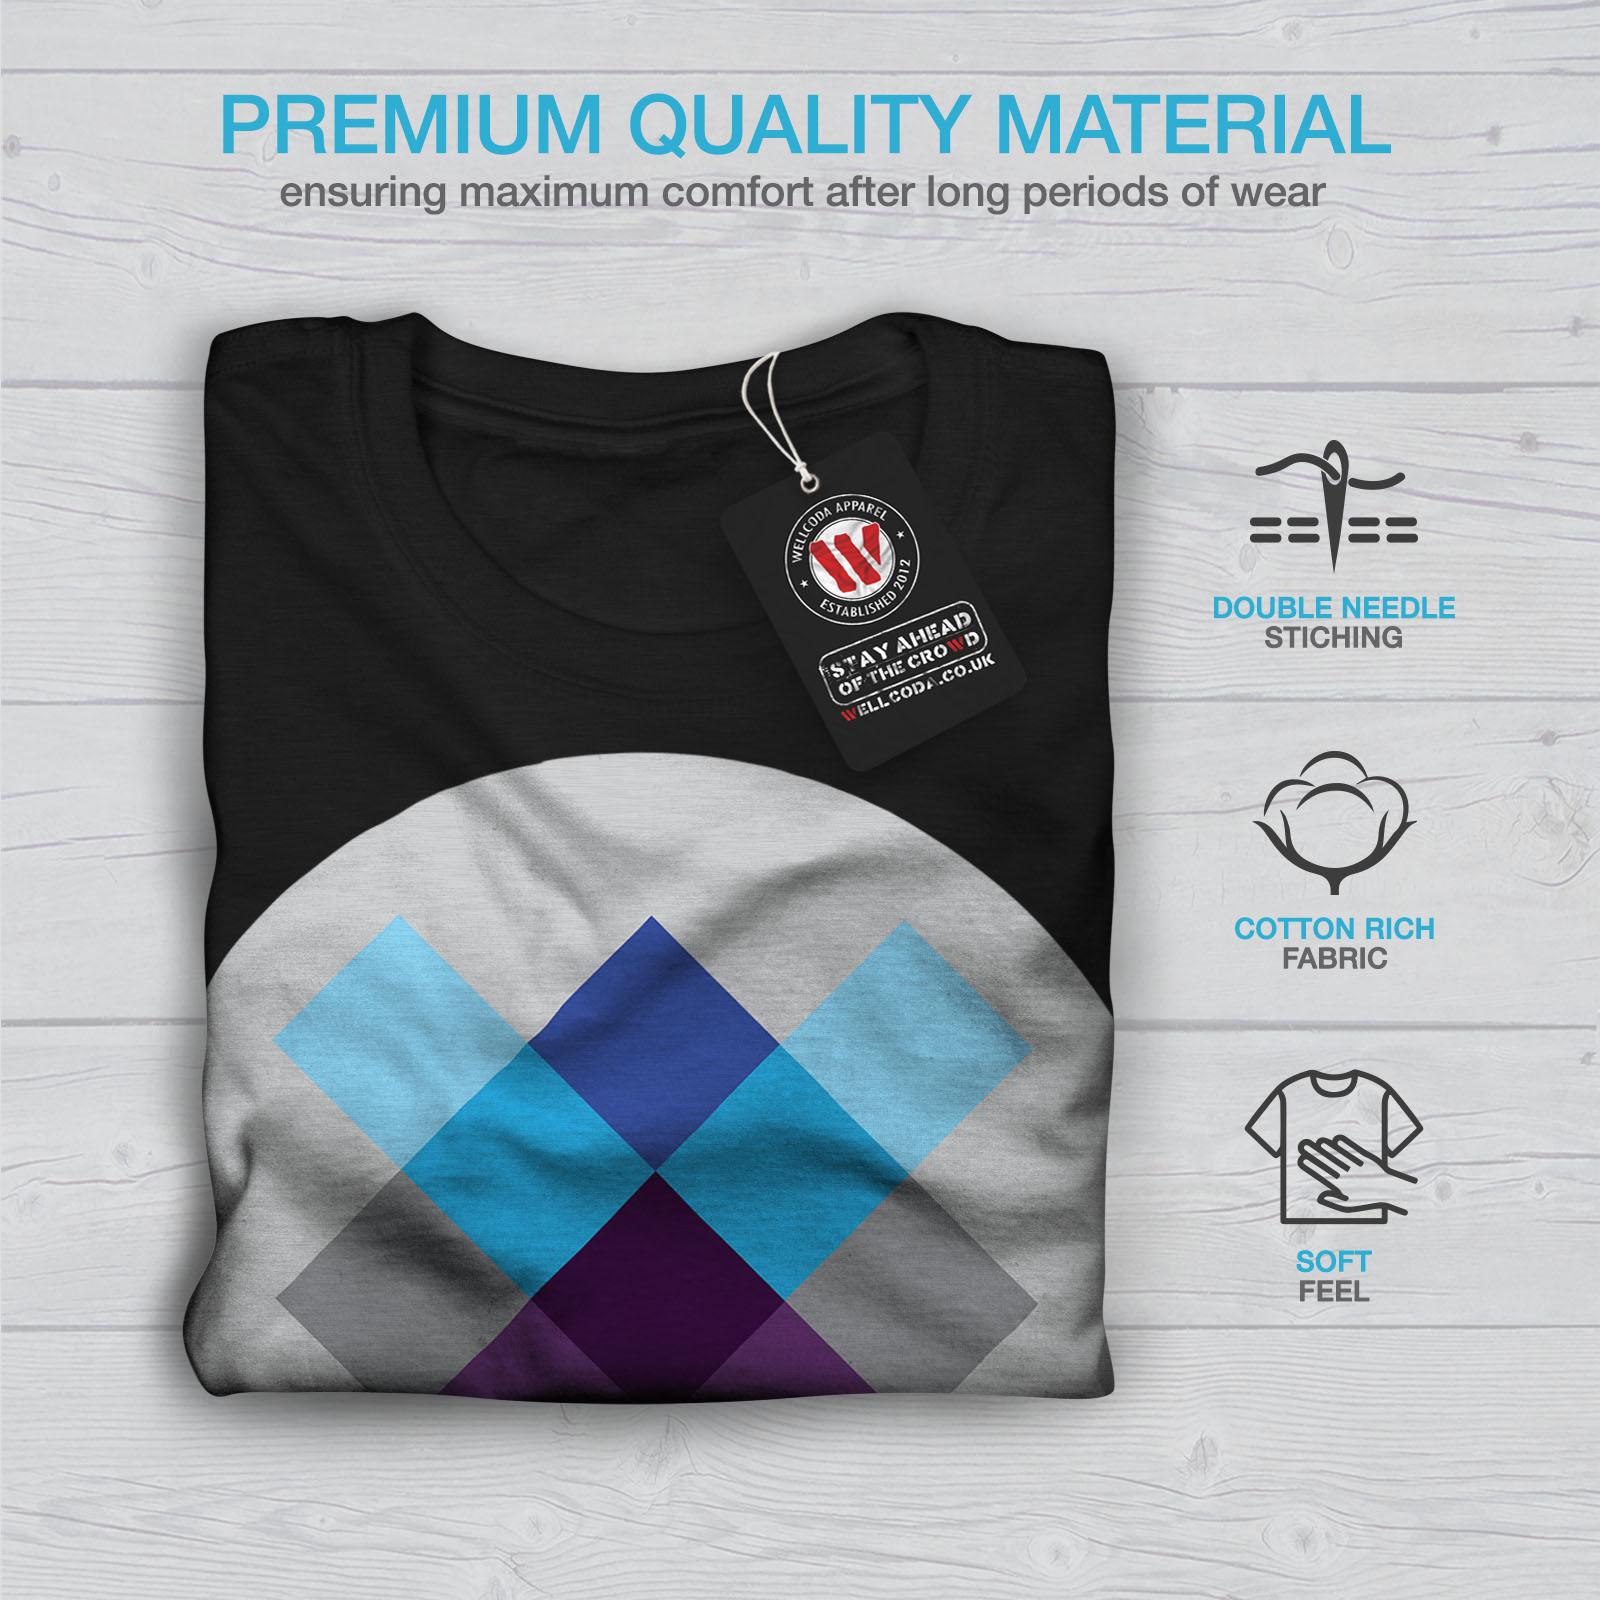 spostandosi design grafico stampato T-shirt Wellcoda GEOMETRIA Ornamento Da Uomo T-shirt